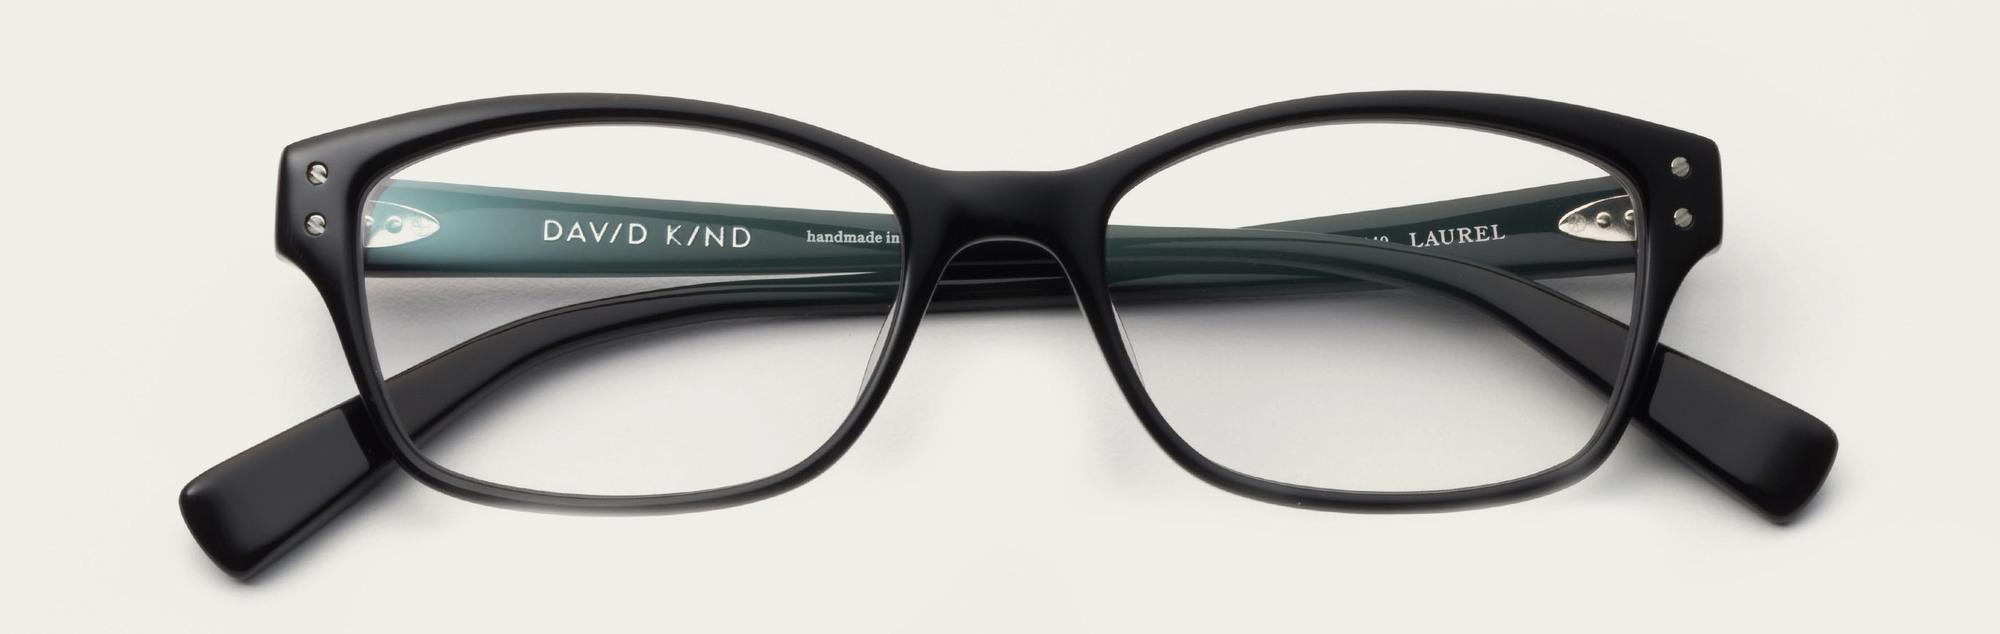 Laurel // DAVID KIND - Online eyewear, RX eyeglasses & sunglasses. 6 ...